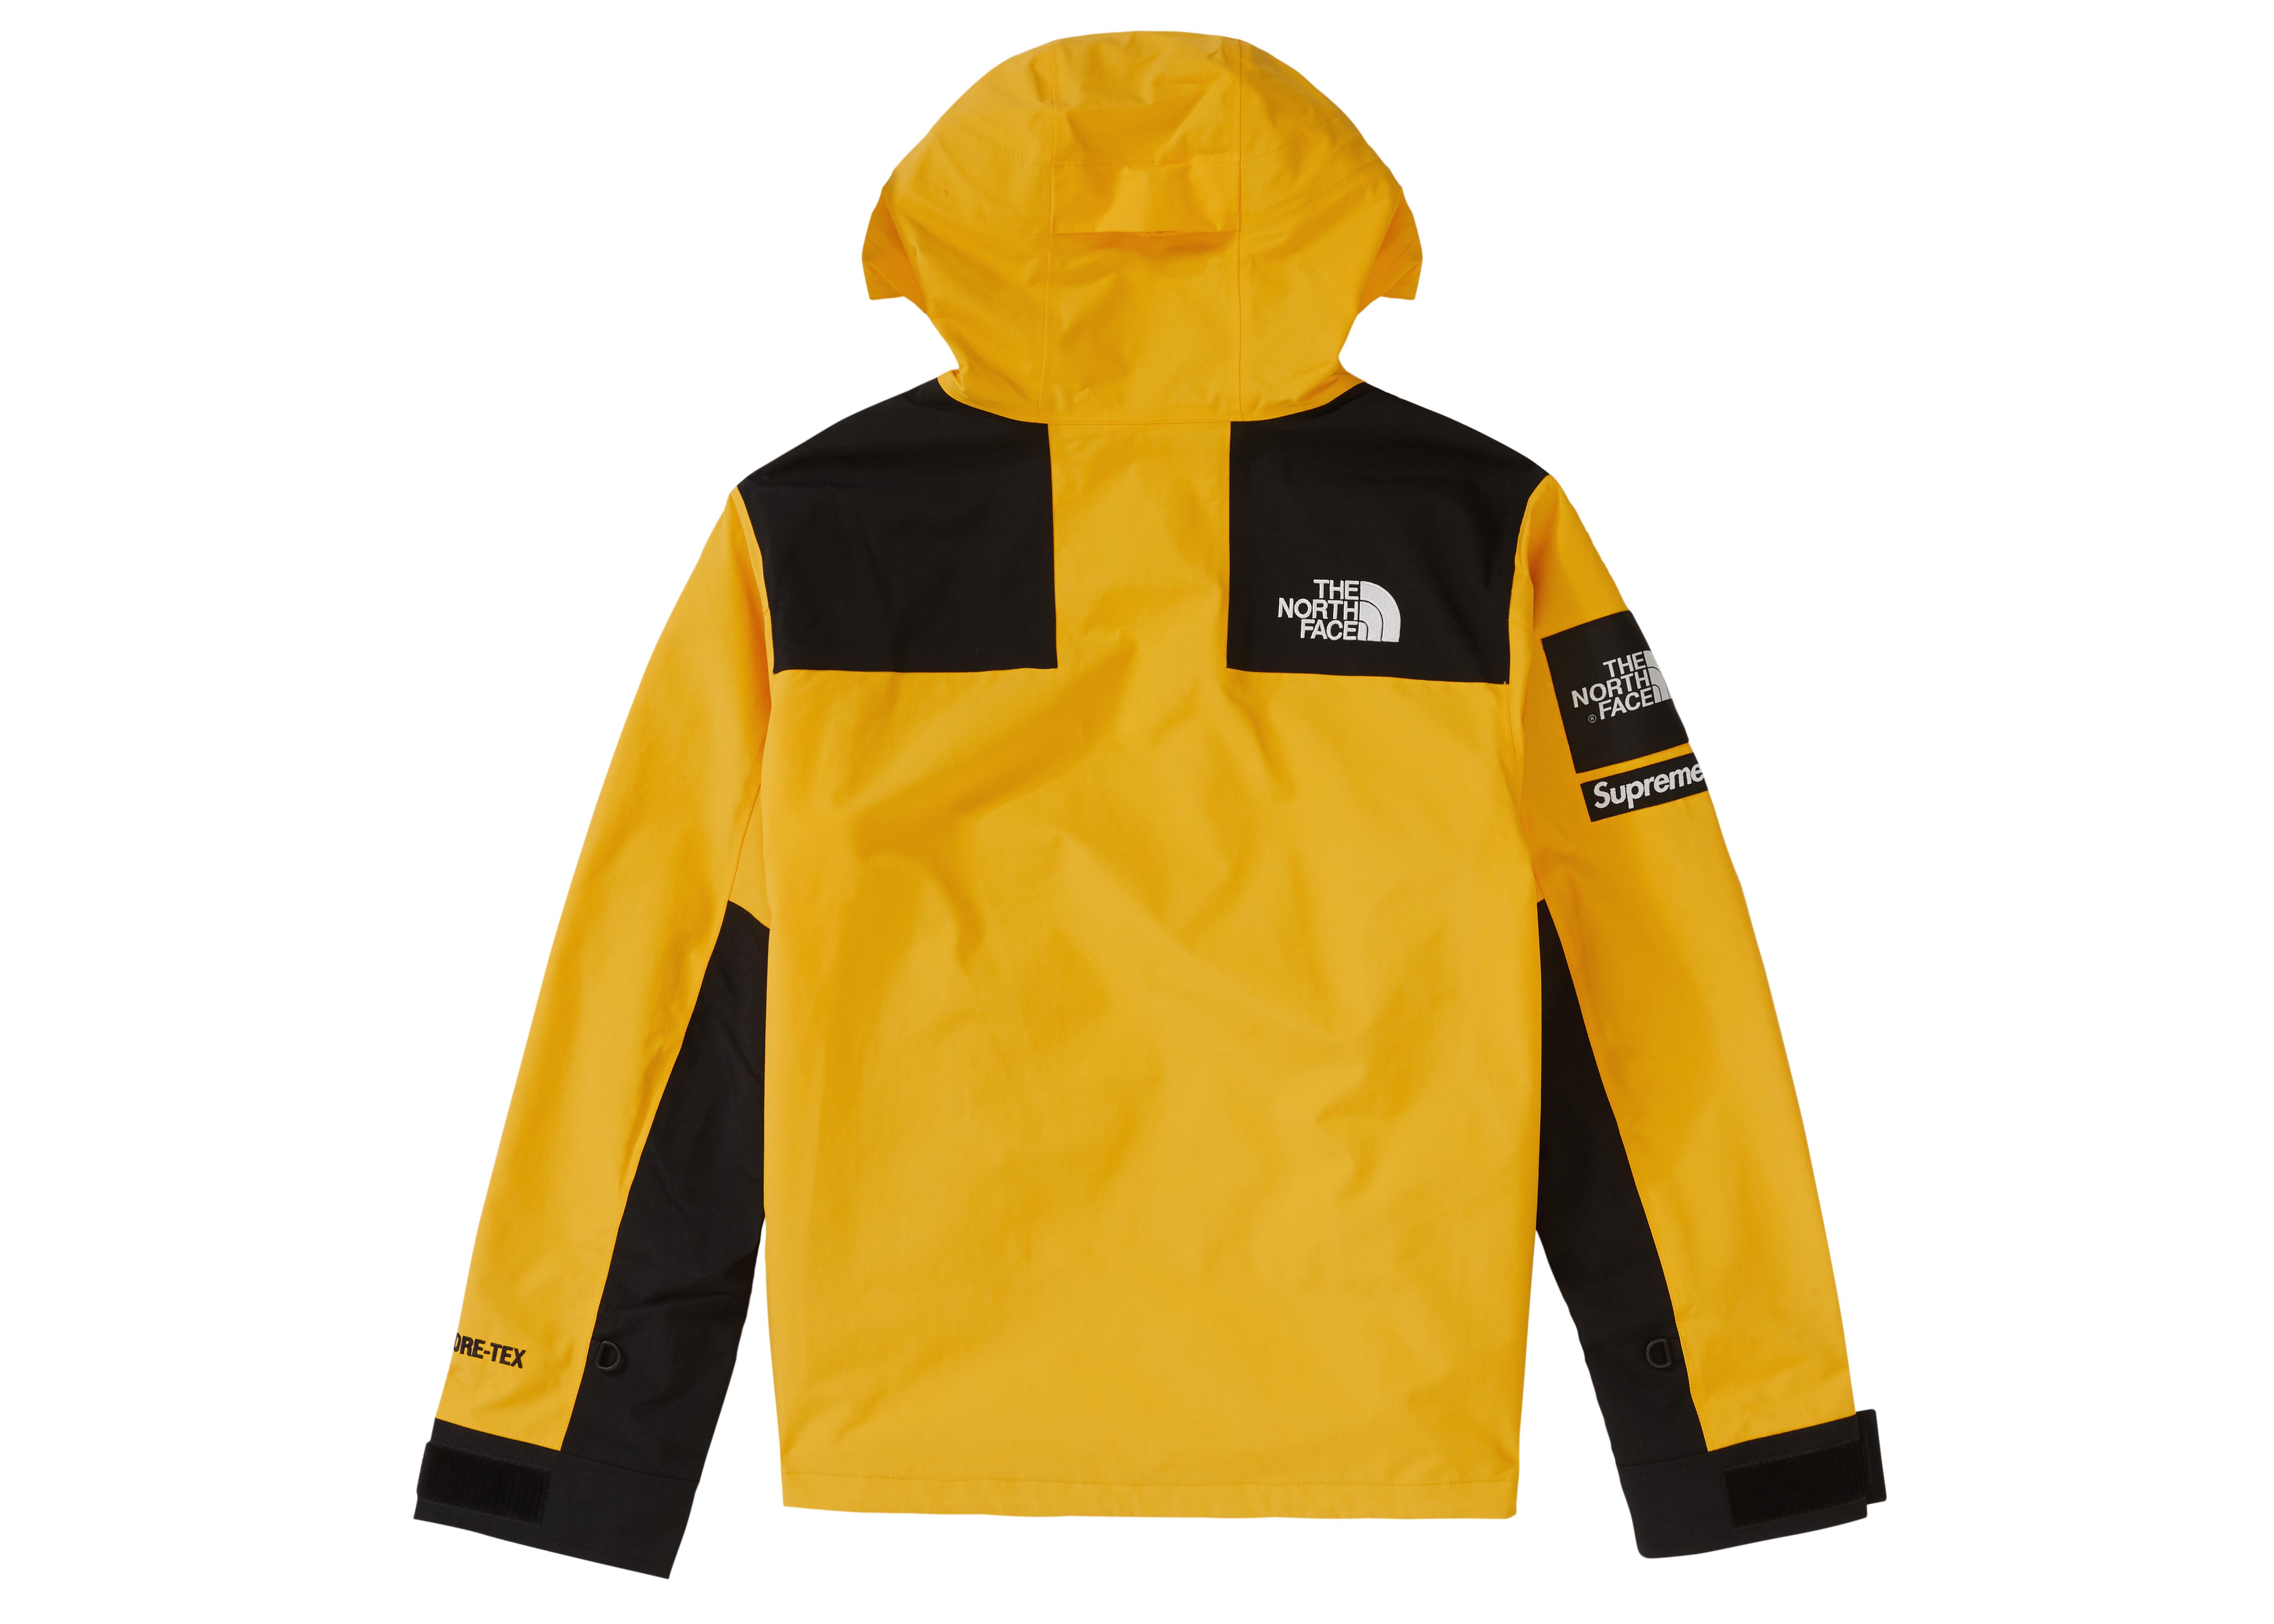 Supreme Jackets Buyamp; Streetwear Sell Jackets Sell Supreme Buyamp; 80kwnOP